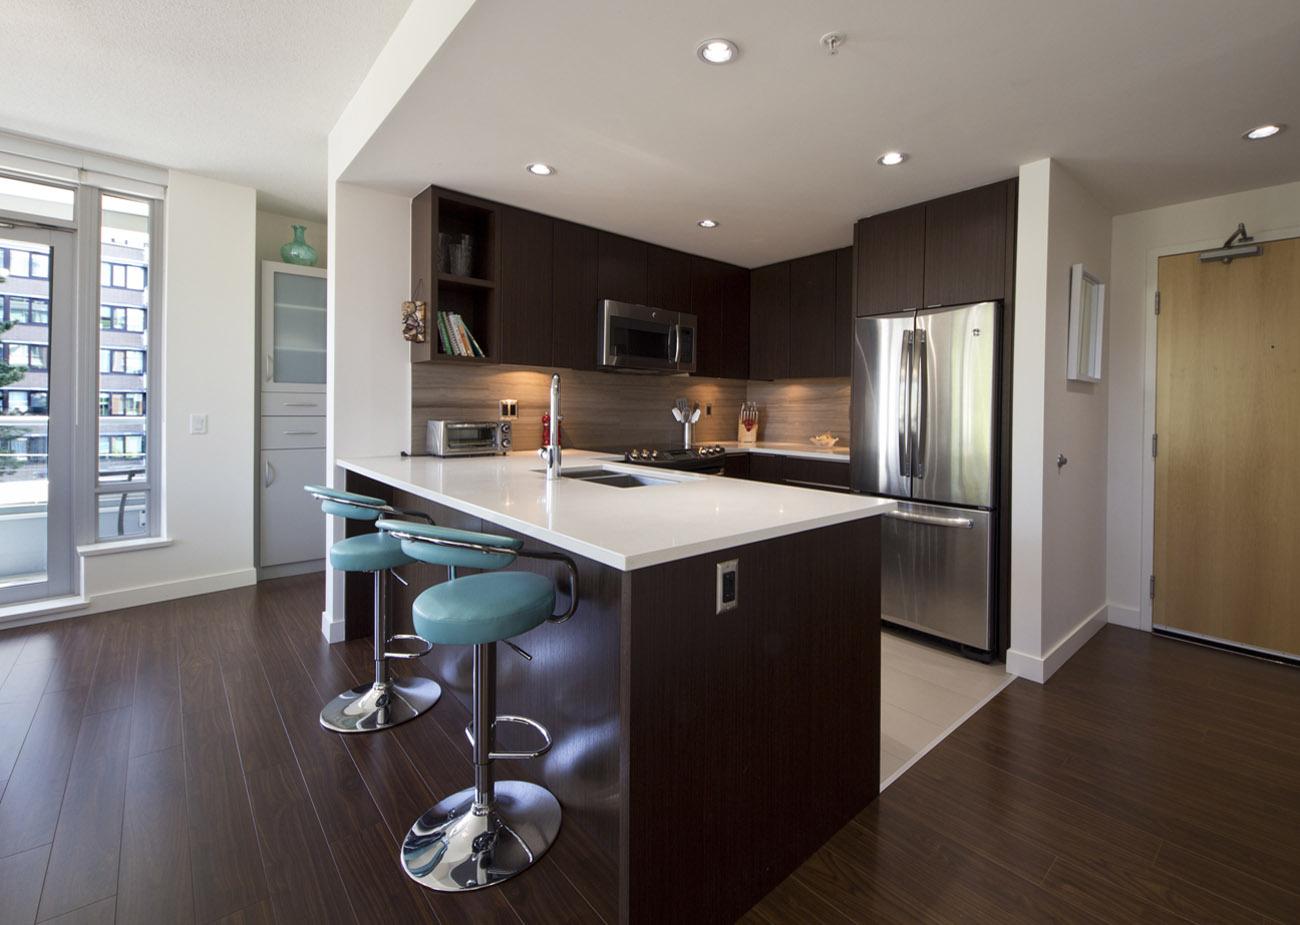 Suite kitchen with breakfast bar